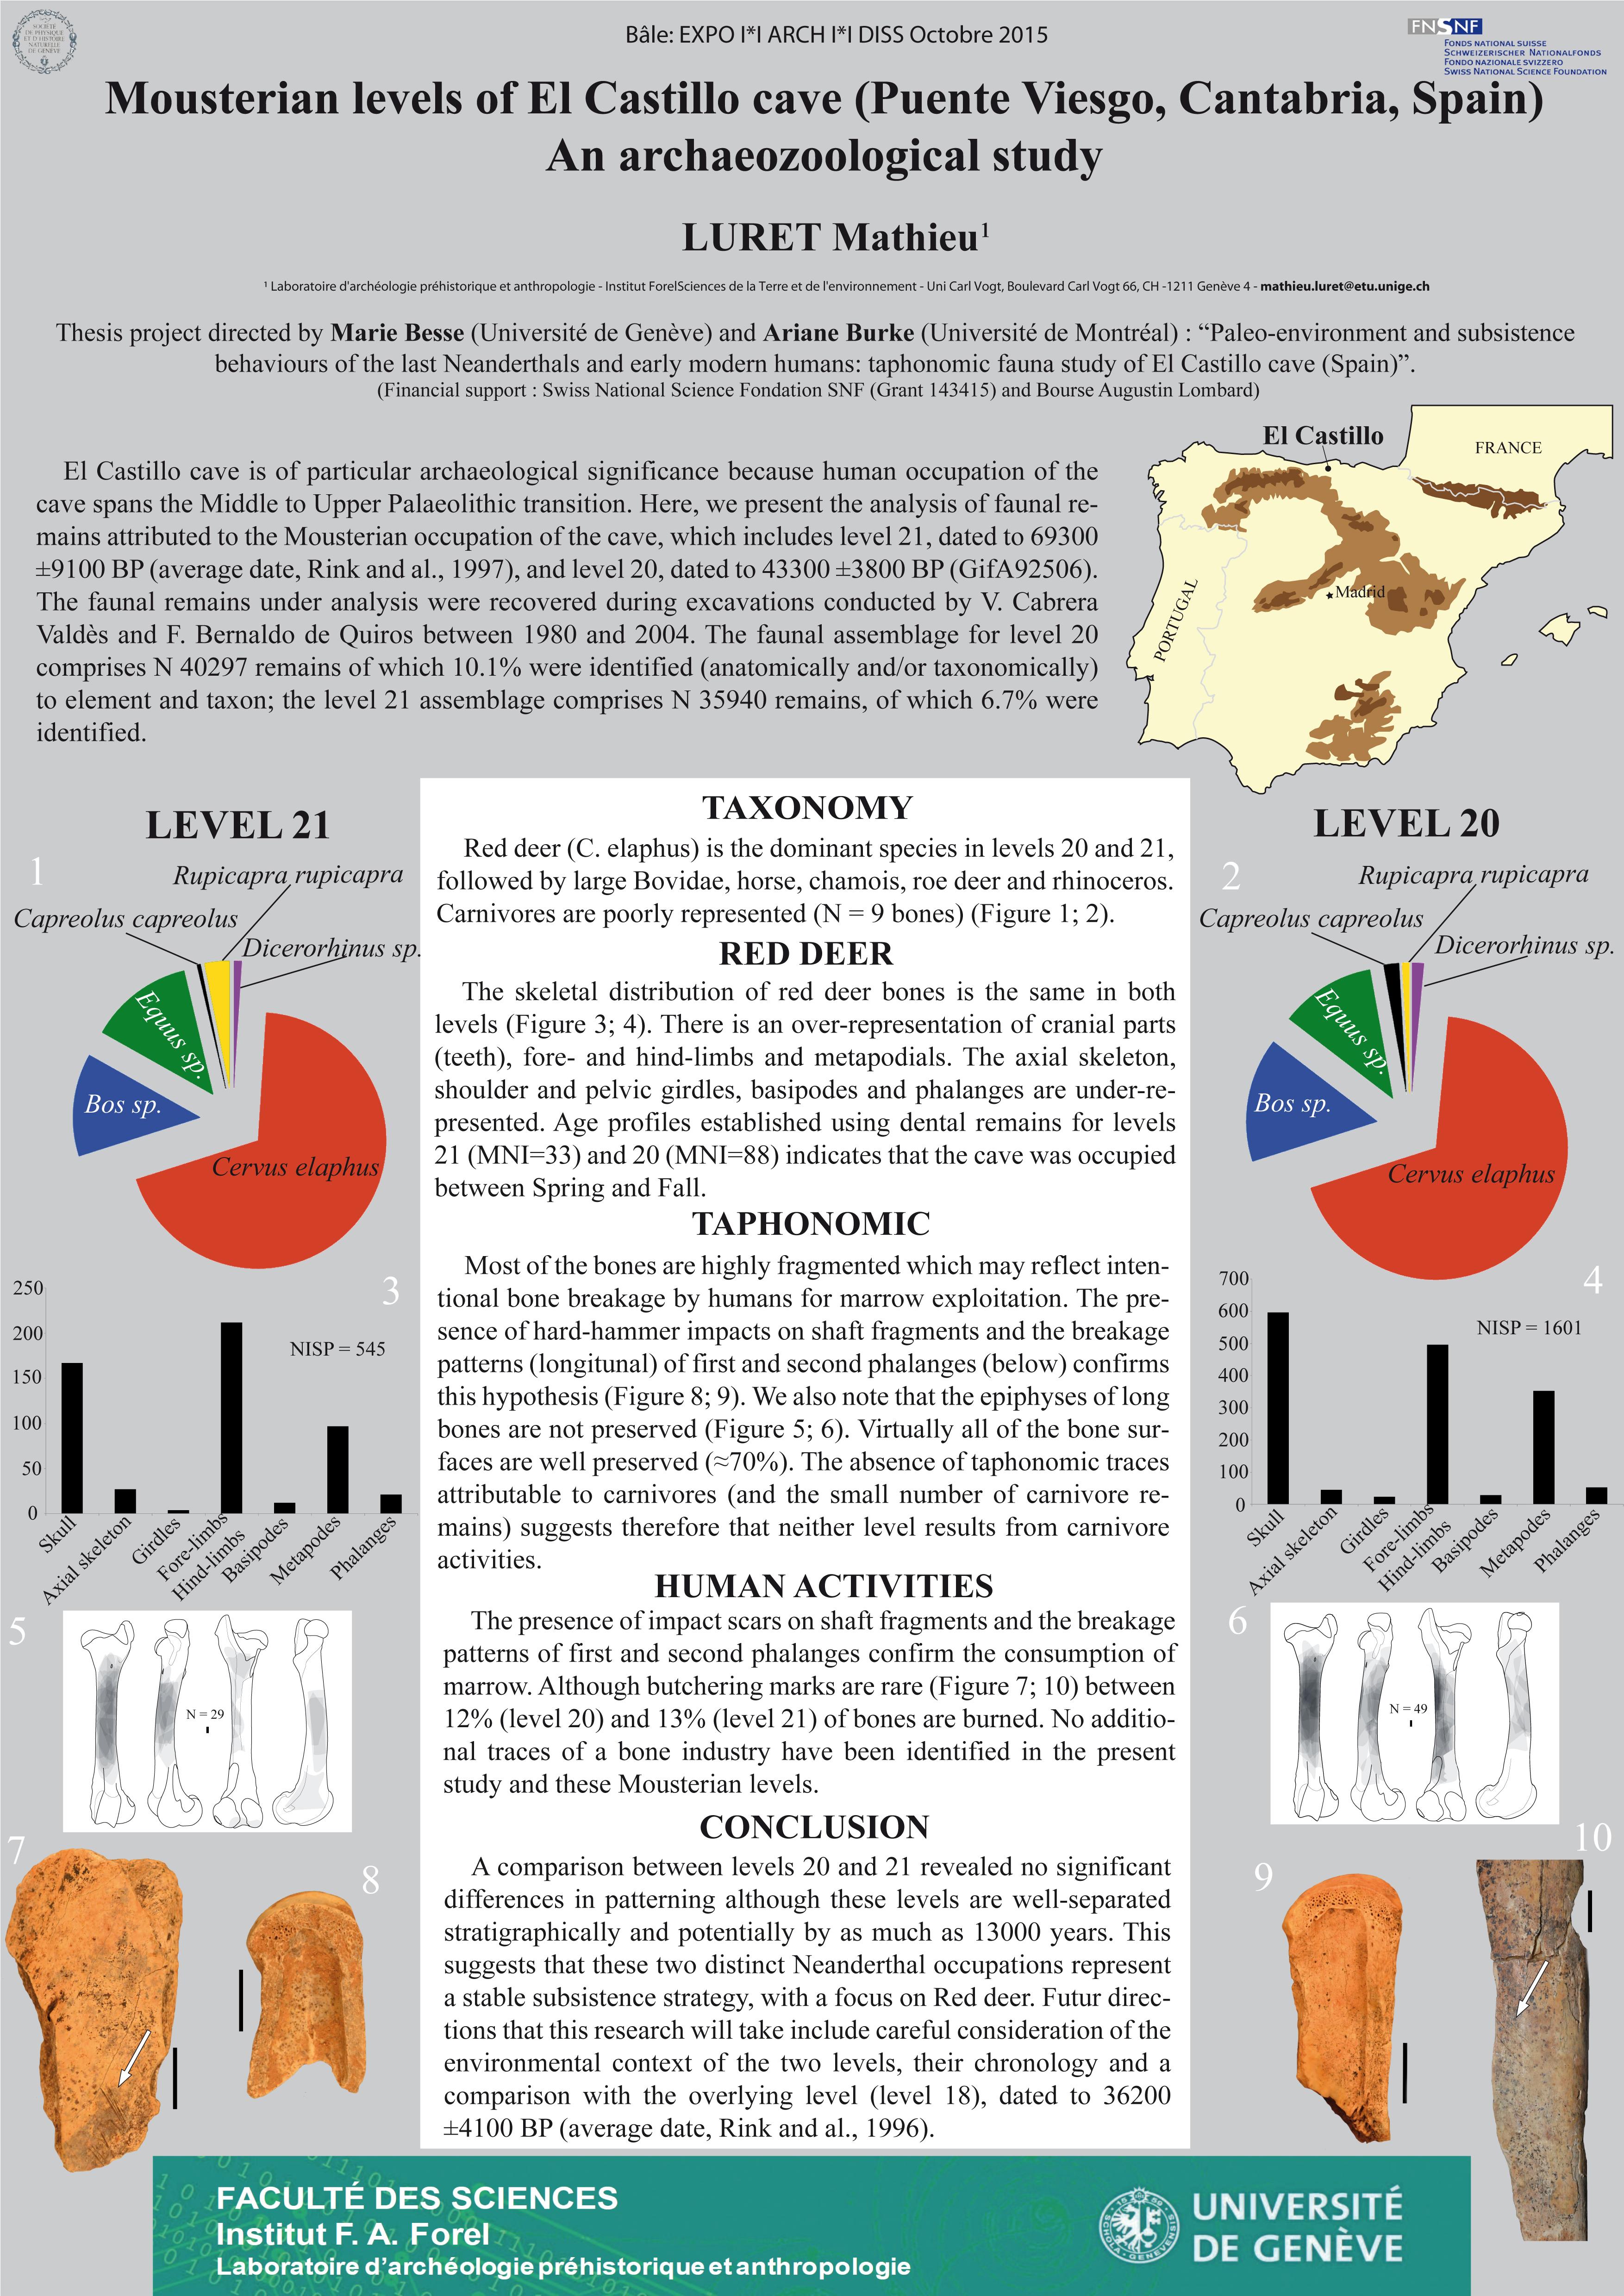 Mathieu LURET: Mousterian levels of El Castillo cave (Puente Viesgo, Cantabria, Spain). An archaeozoological study.